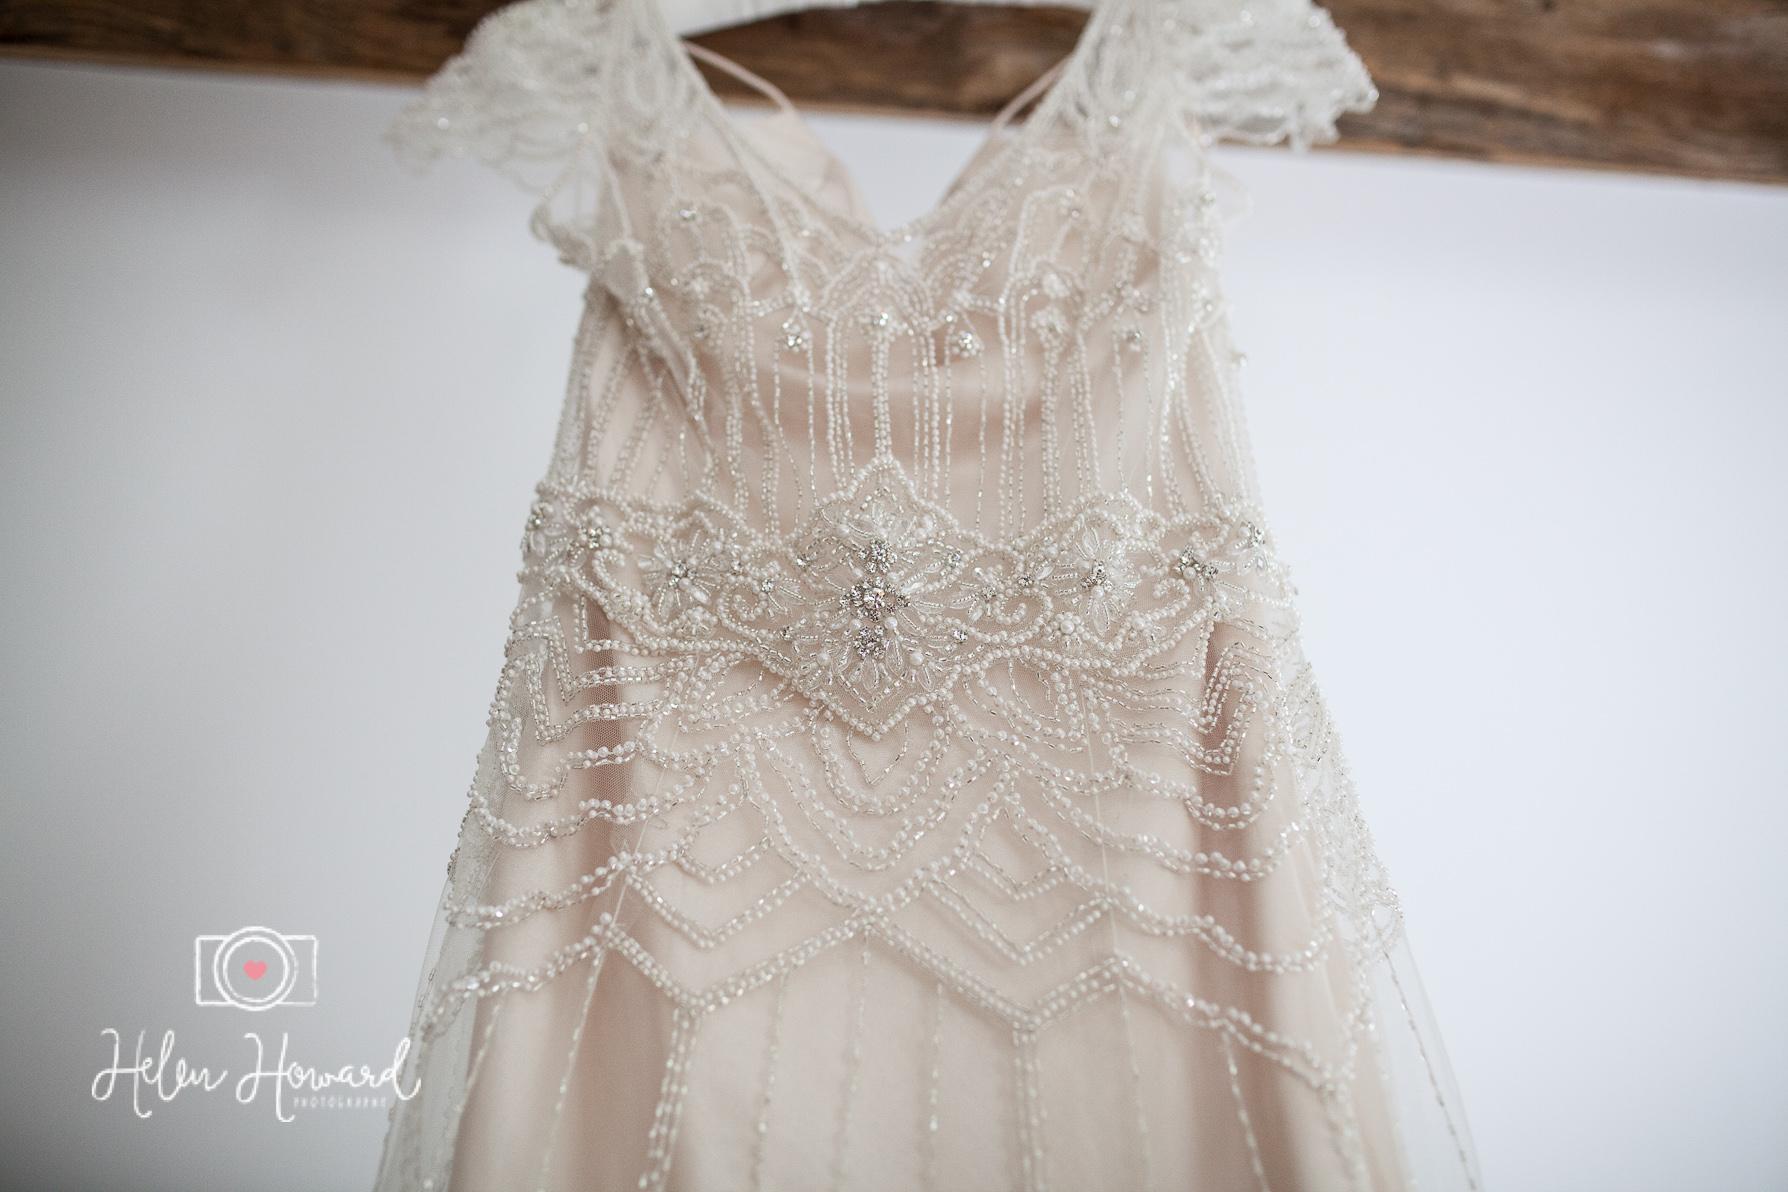 Helen Howard Photography Packington Moor Wedding-3.jpg